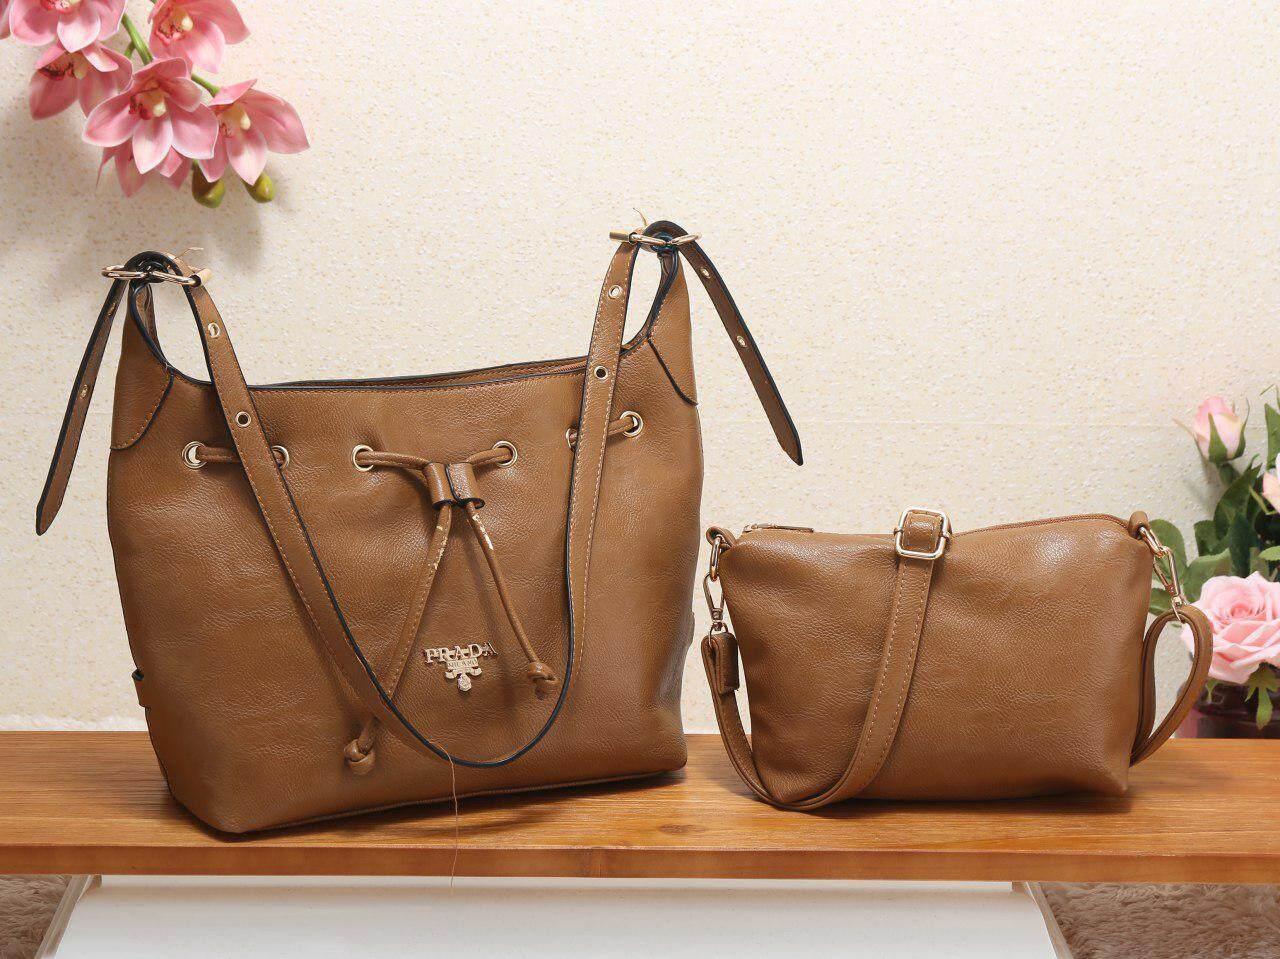 89792ff5d0b549 Prada Women Cross Body & Shoulder Bags price in Malaysia - Best ...